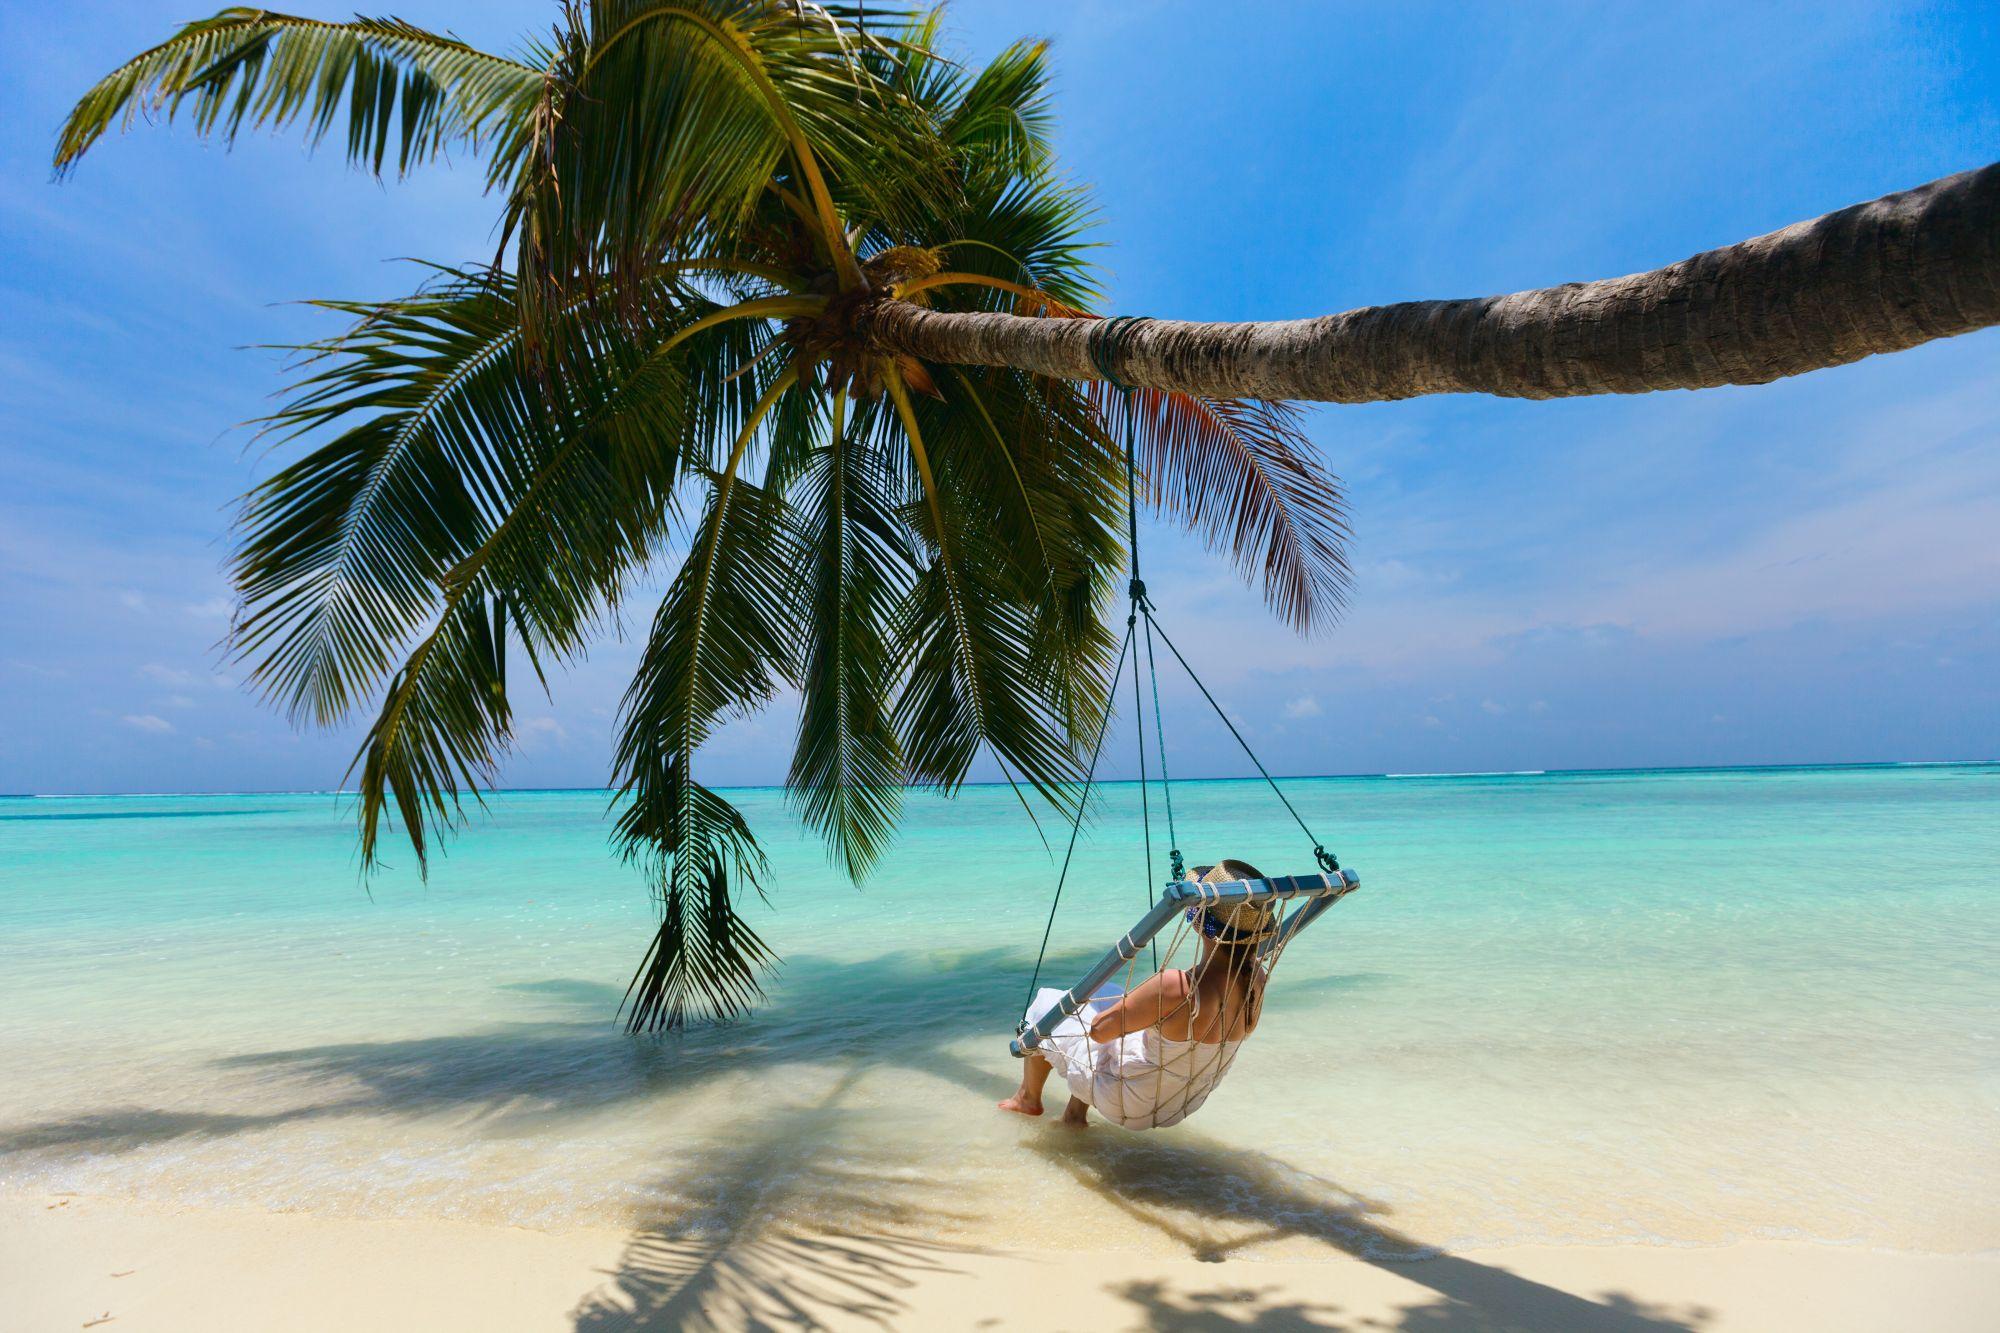 Karaiby palma i hamak